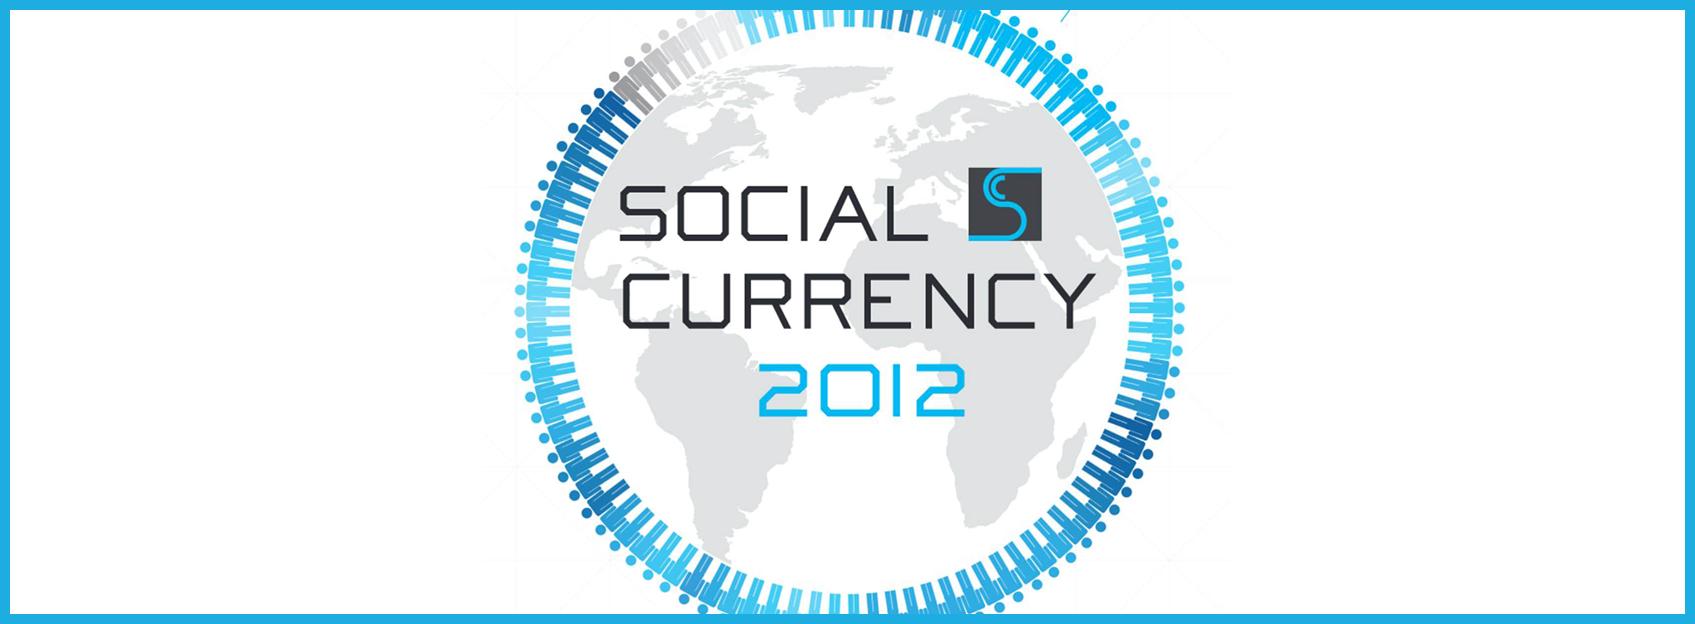 respondi sponsor de l'étude Social Currency 2012